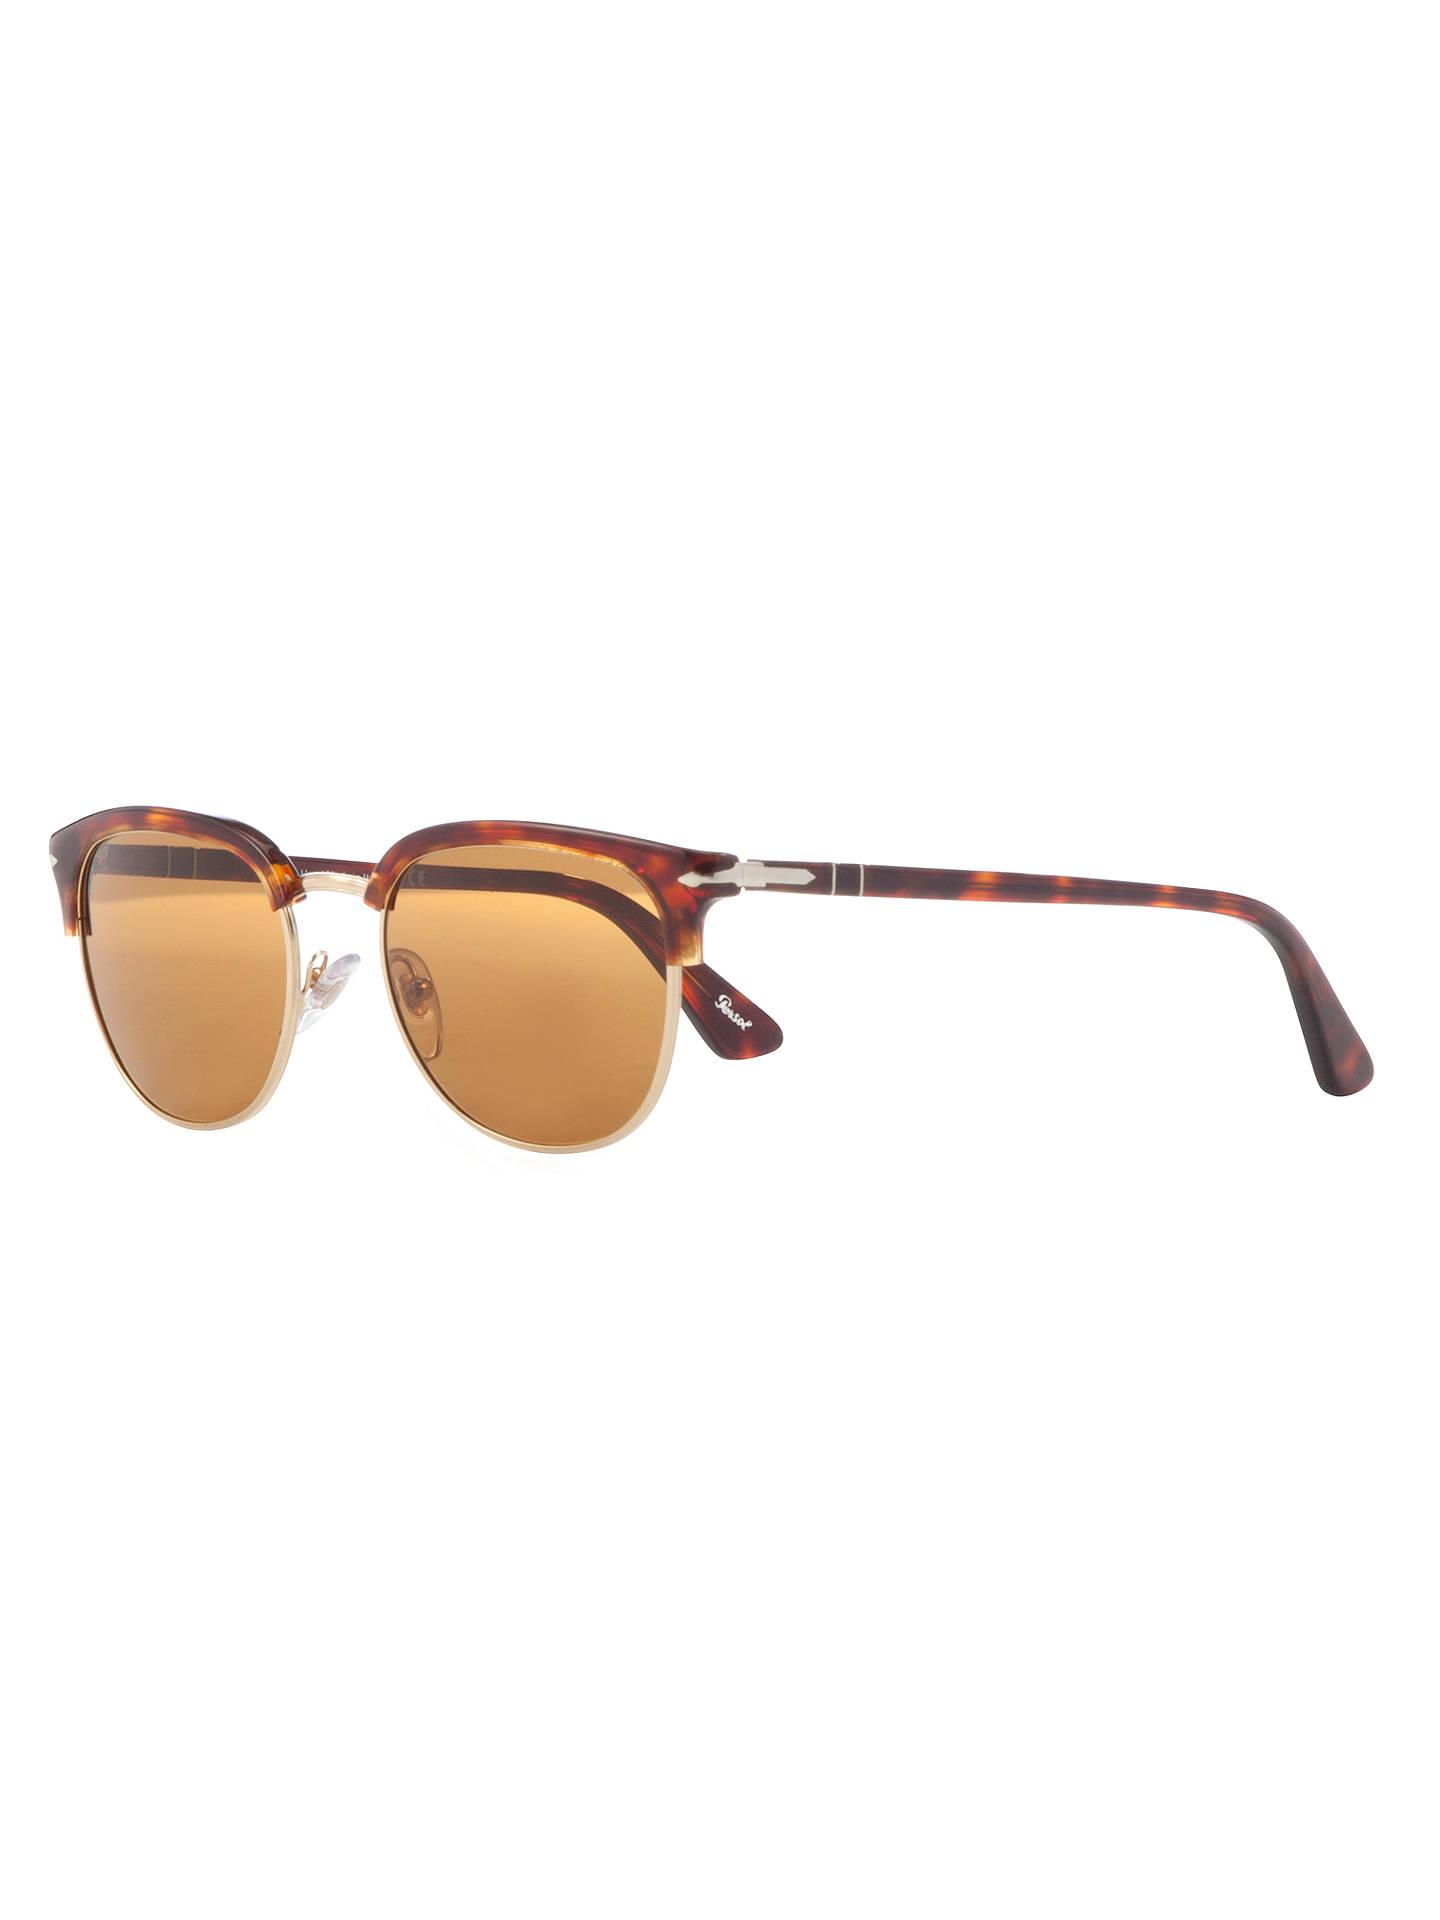 533455111552 Buy Persol PO3105S D-Frame Sunglasses